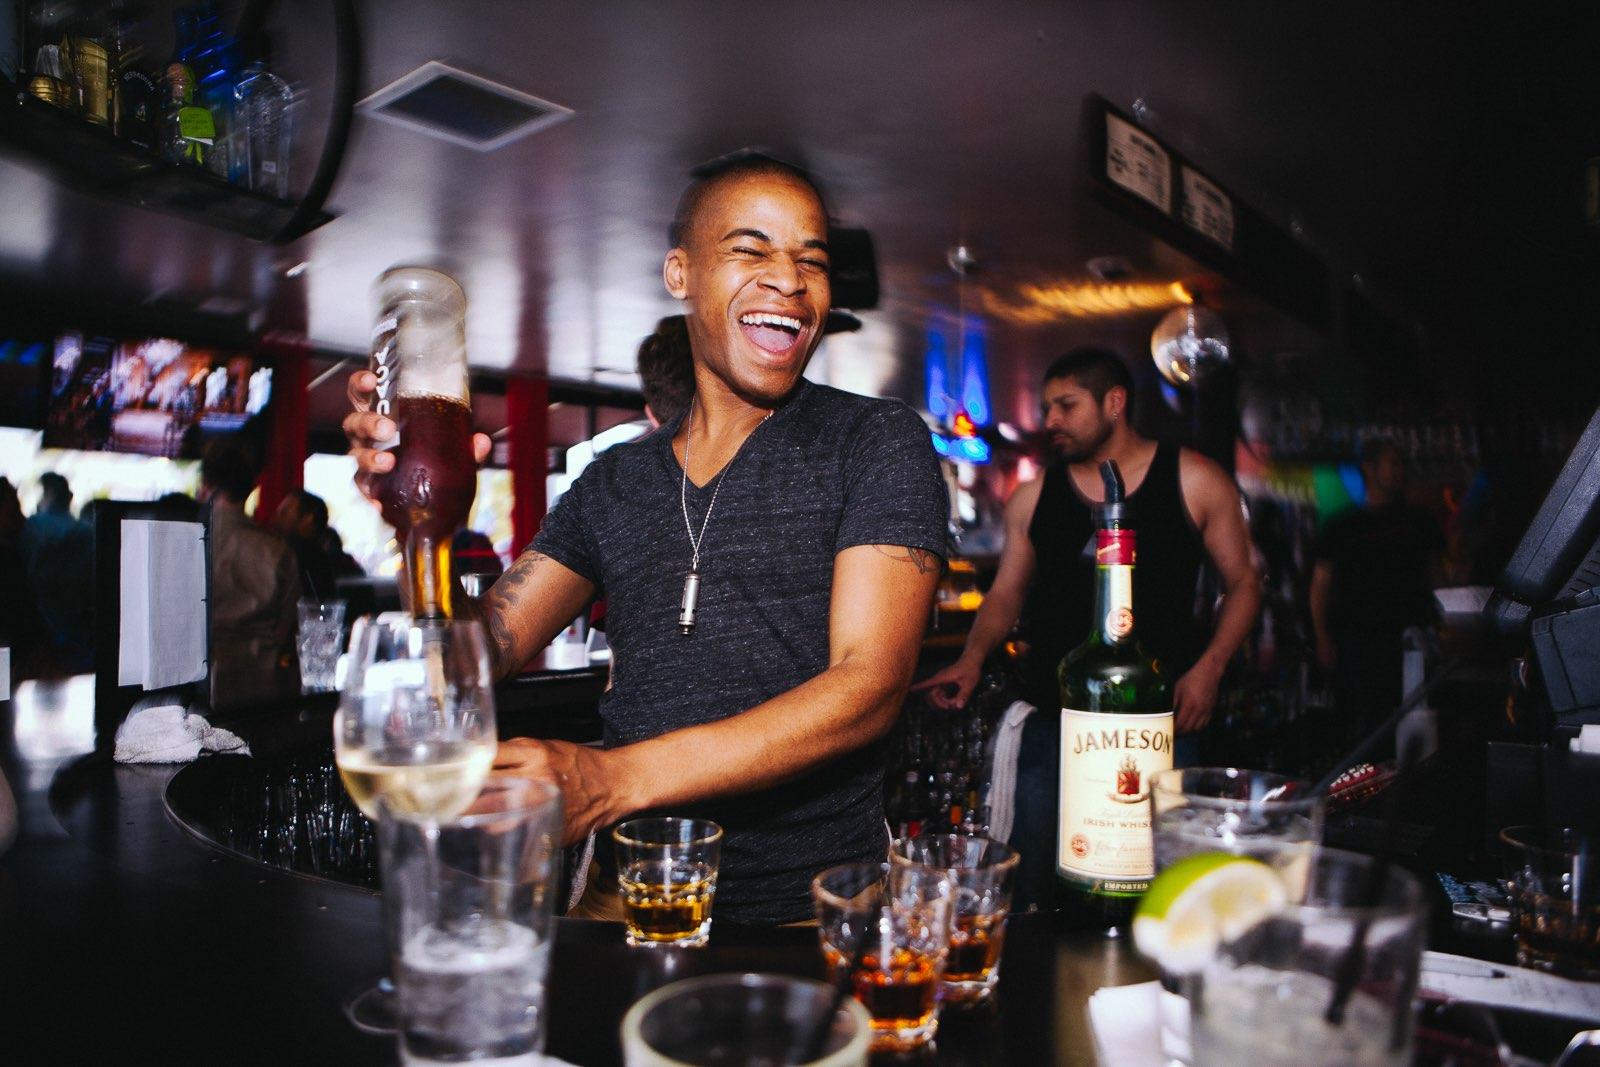 lookout-castro-bartender-7x7-magazine-event Nightlife